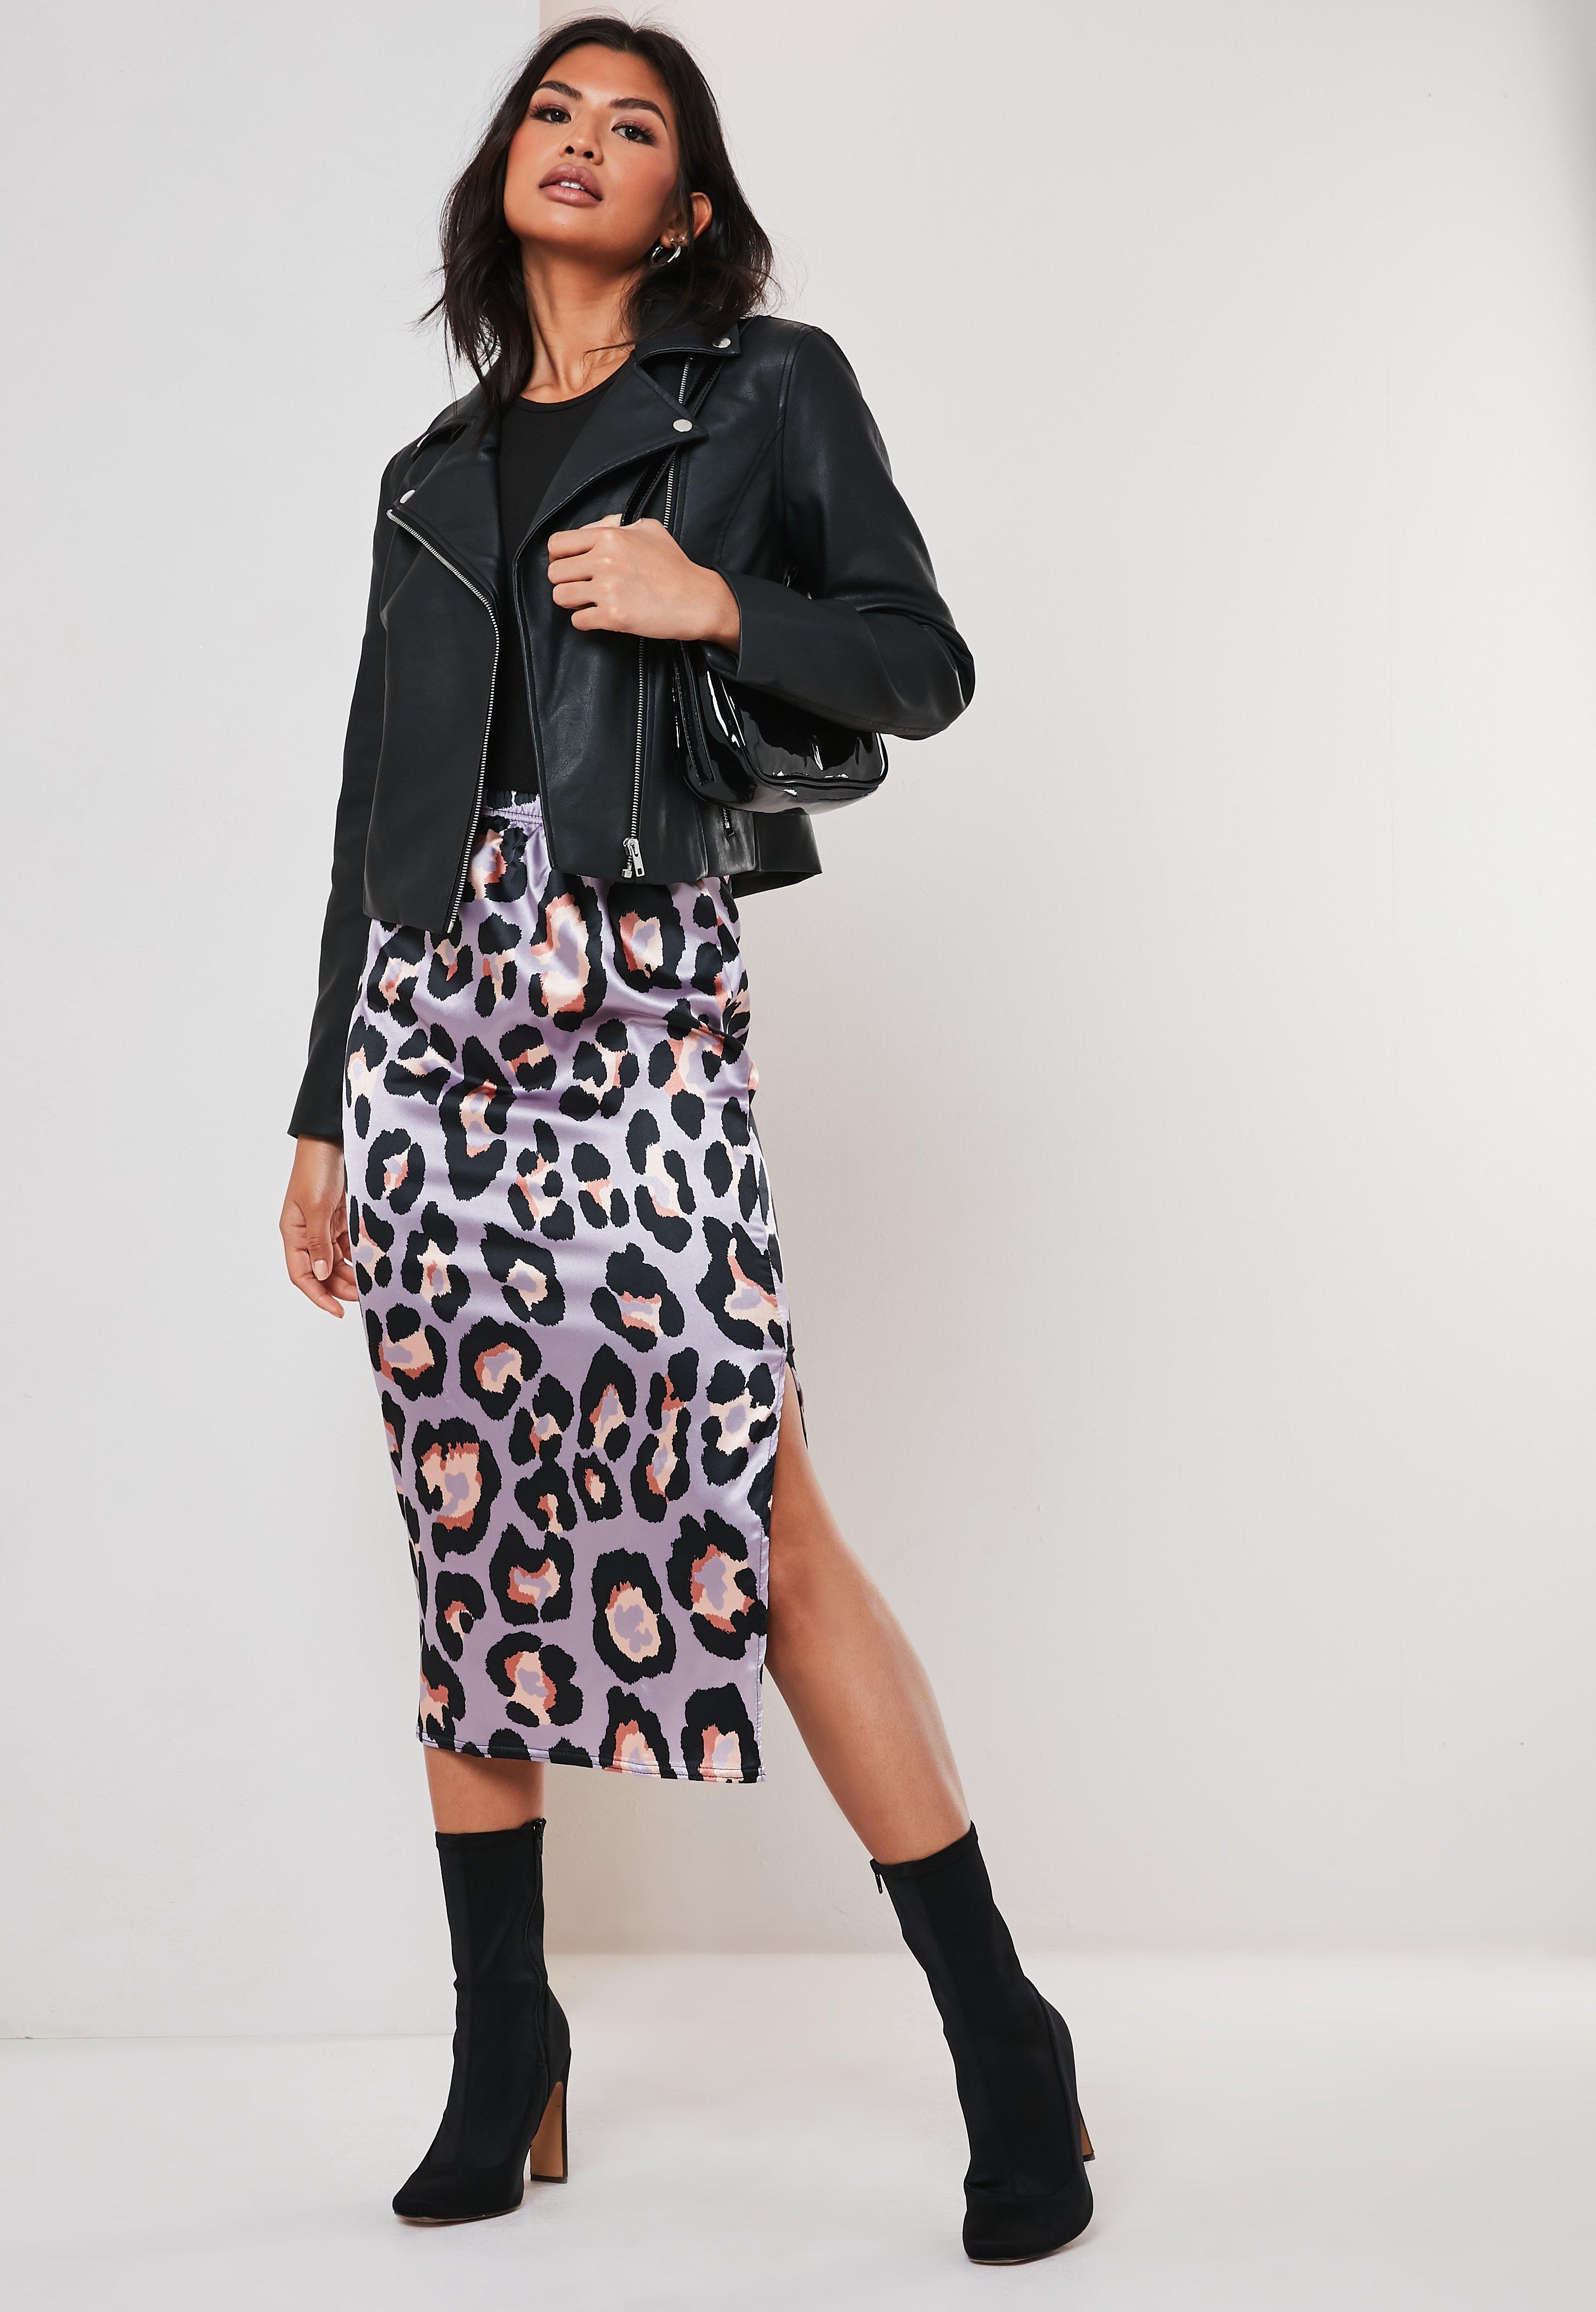 3877a80772 Leopard Print Dresses | Leopard Print Tops & Skirts – Missguided